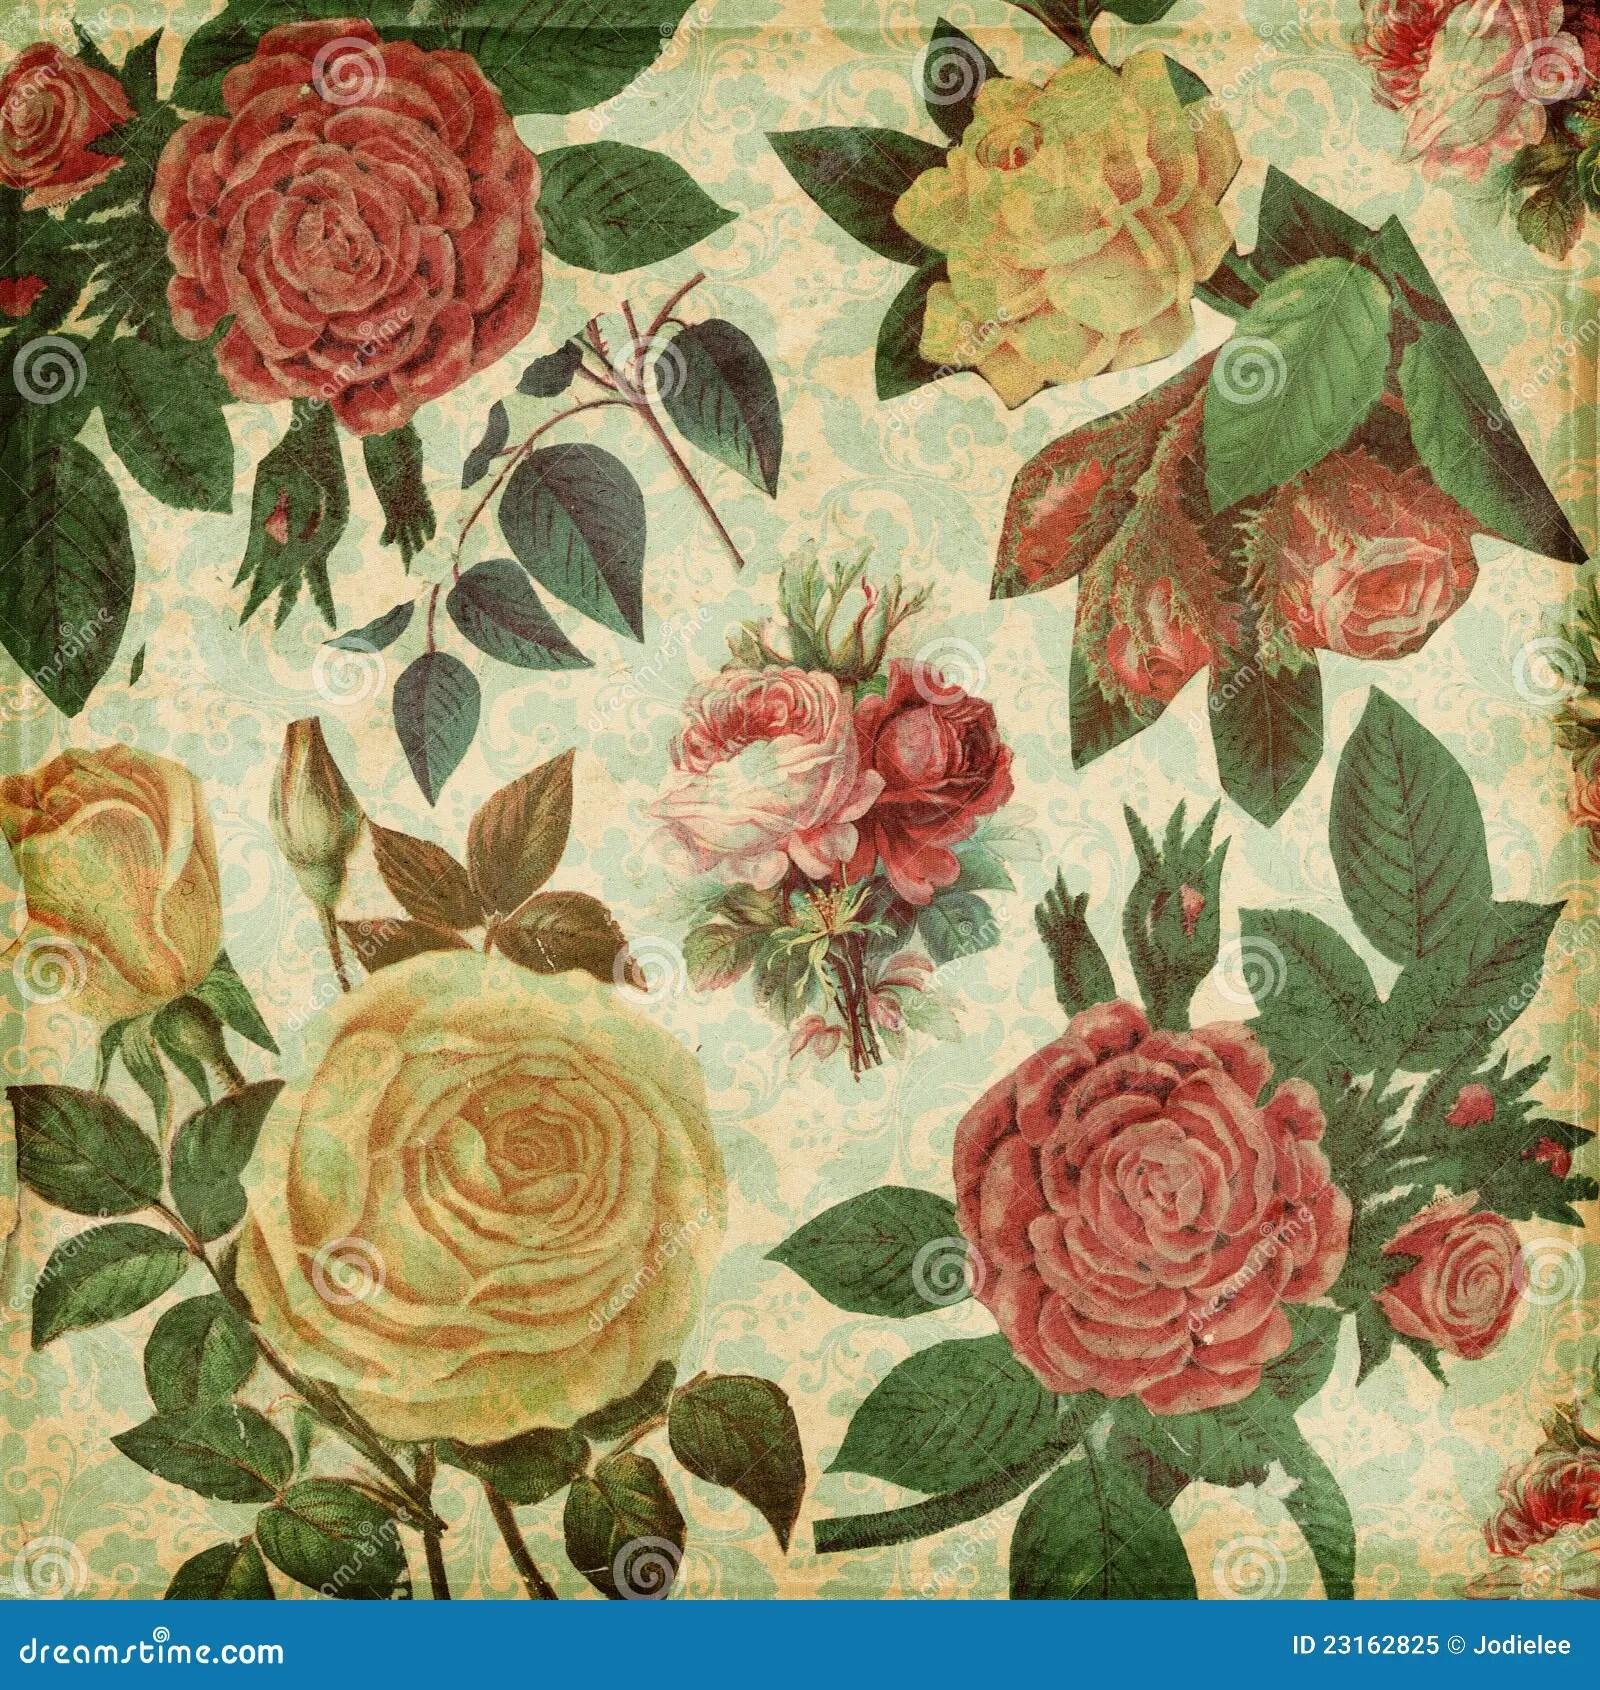 Free Fall Themed Desktop Wallpaper Botanical Vintage Roses Shabby Chic Background Royalty